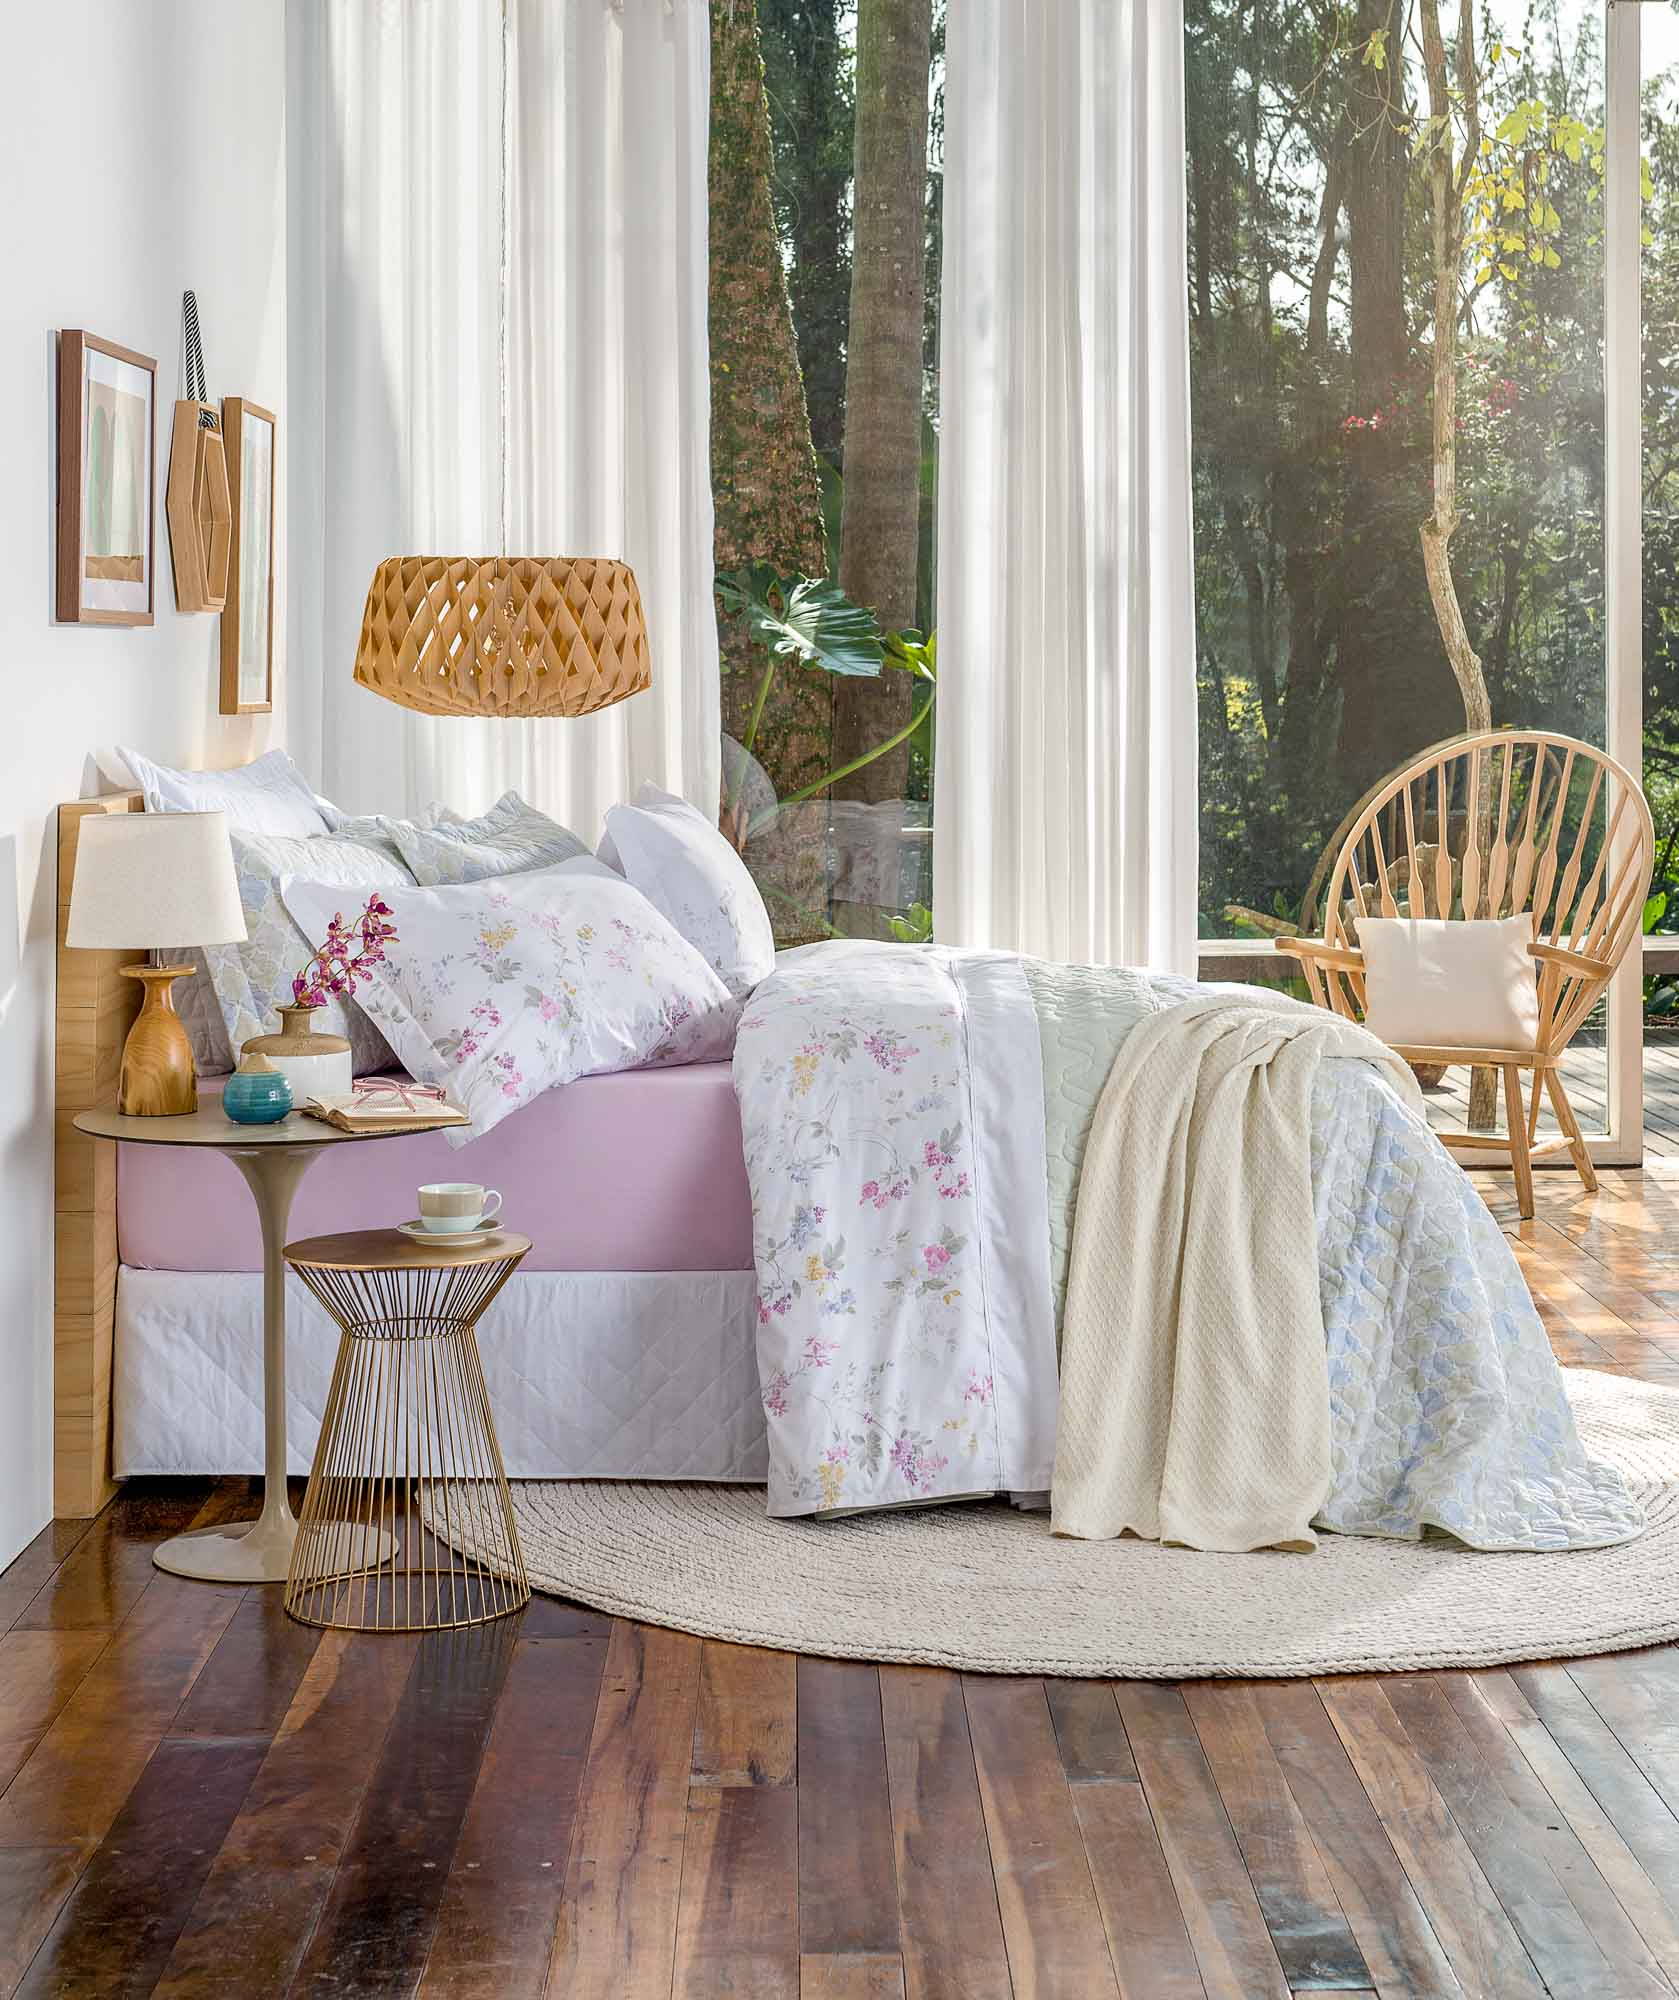 Jogo de lençol casal 200 fios charlotte rosa santista